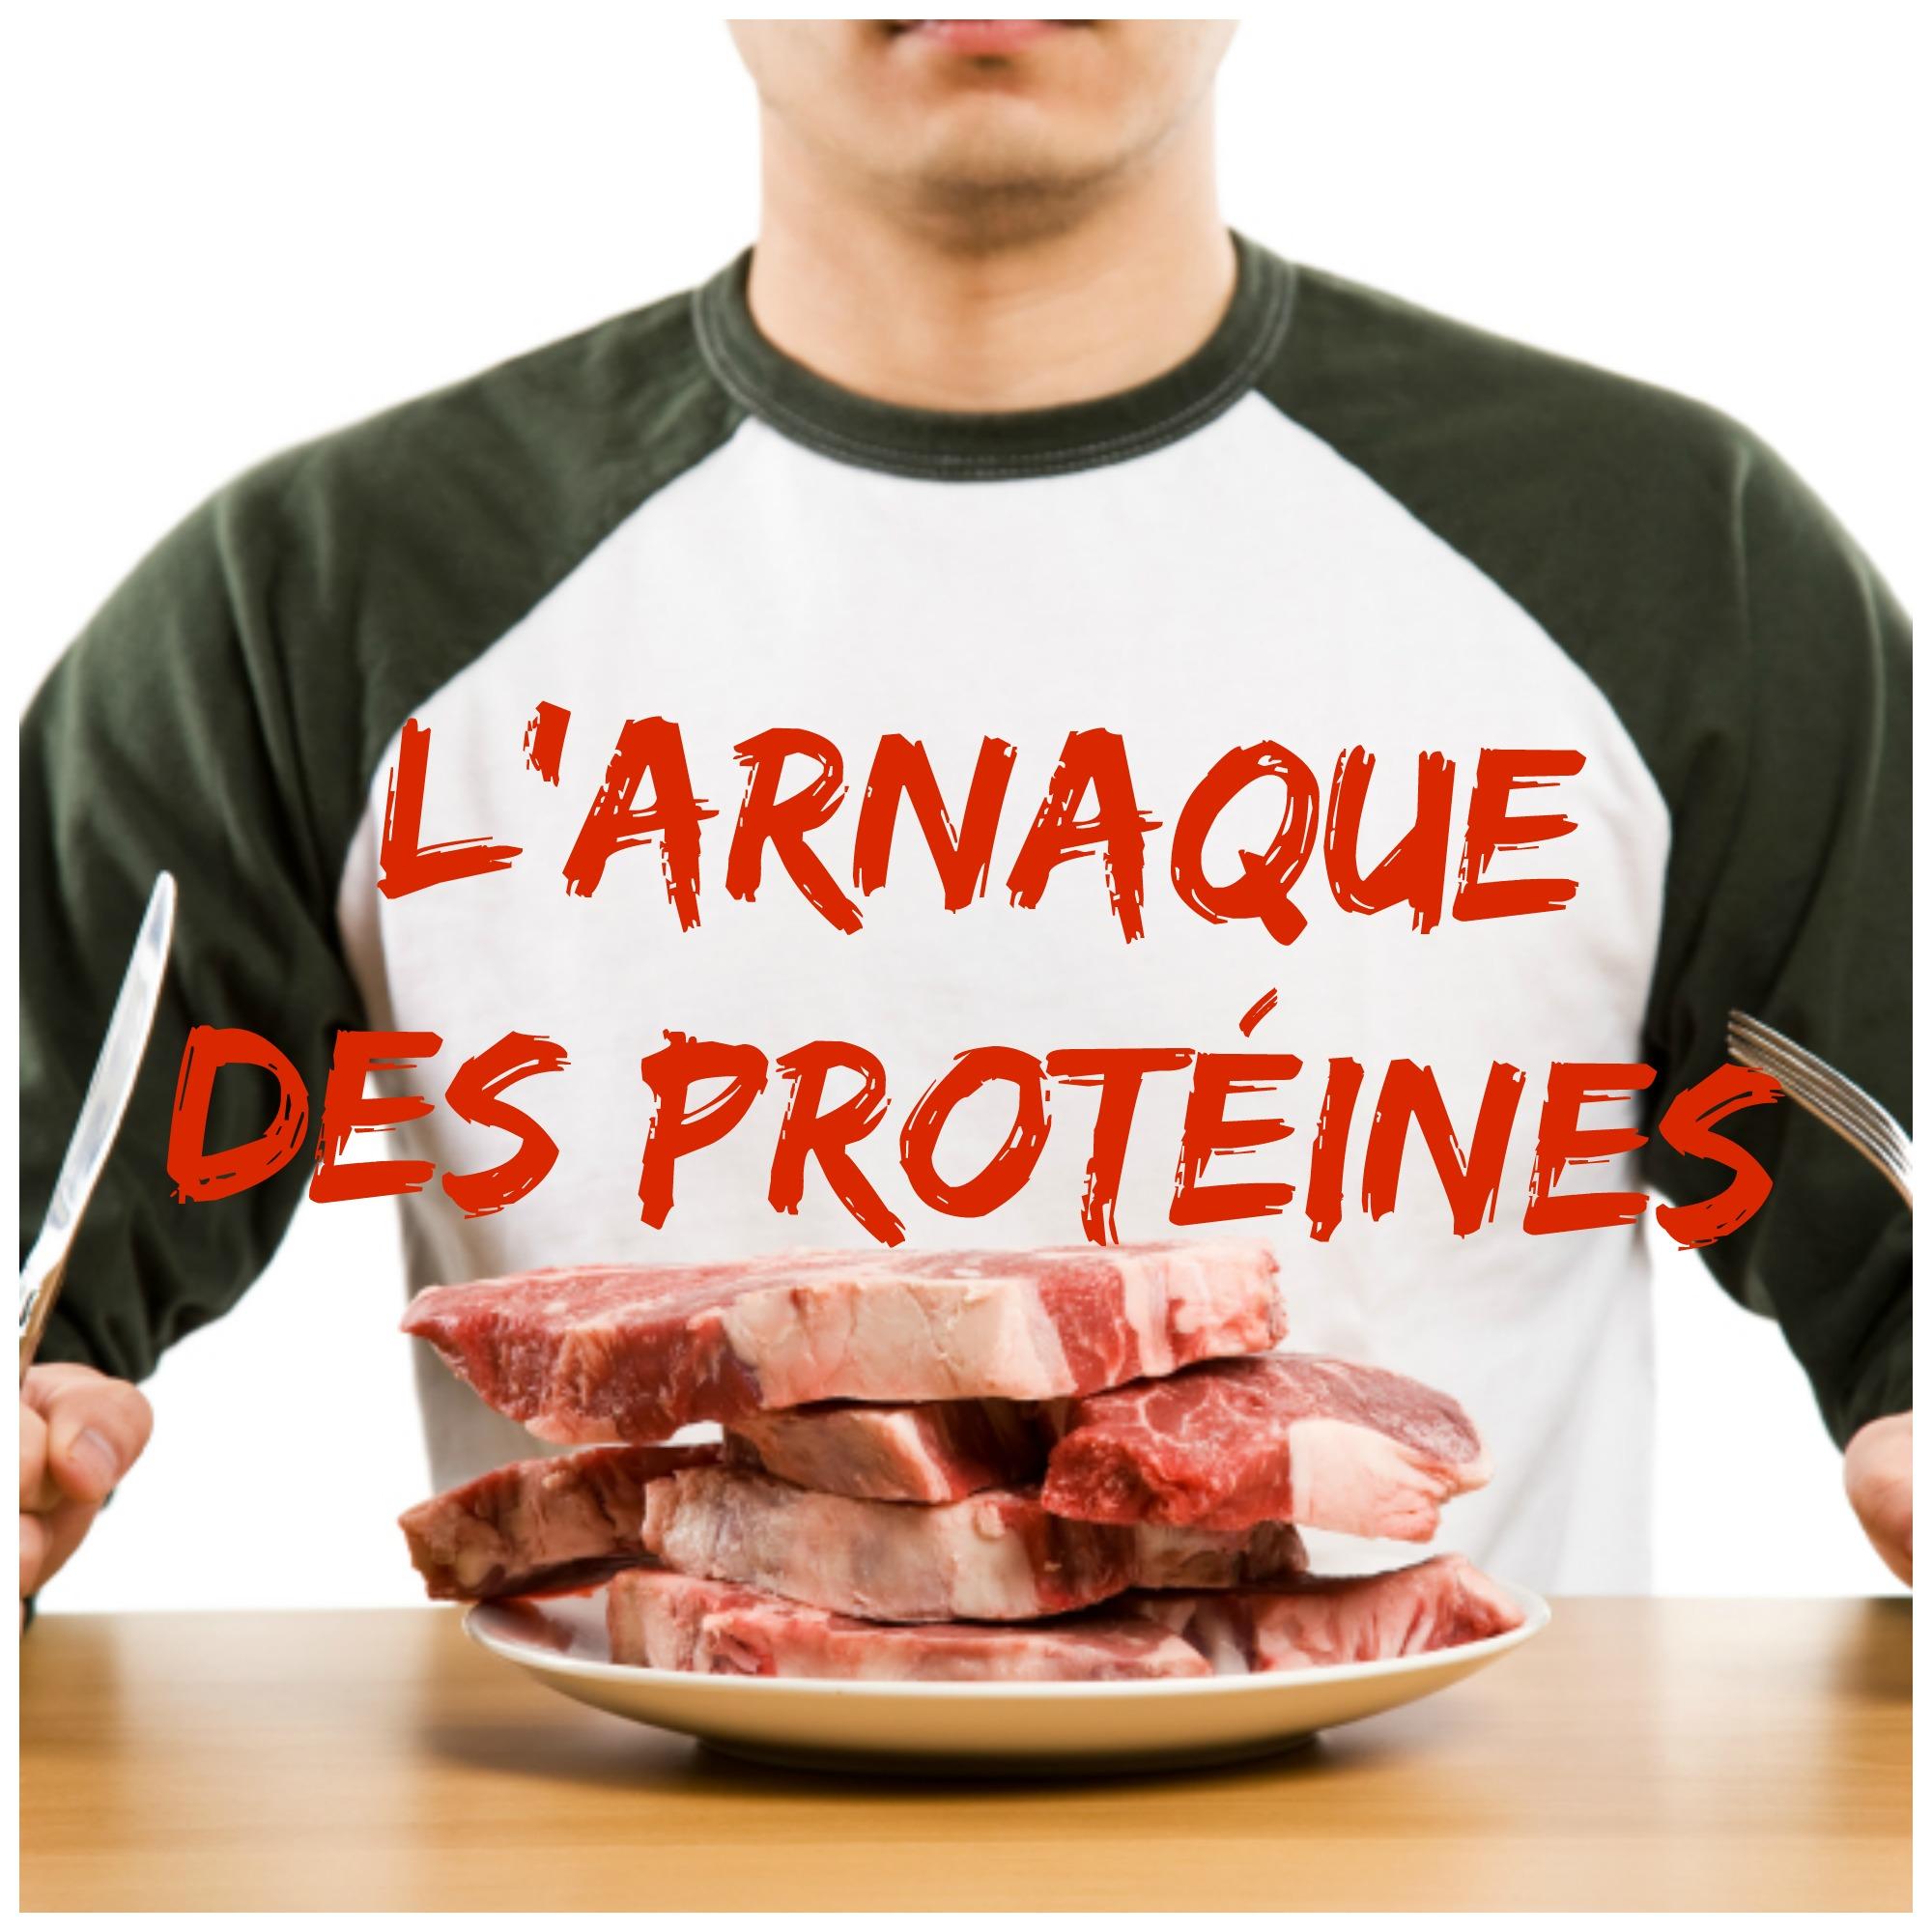 arnaque des protéines